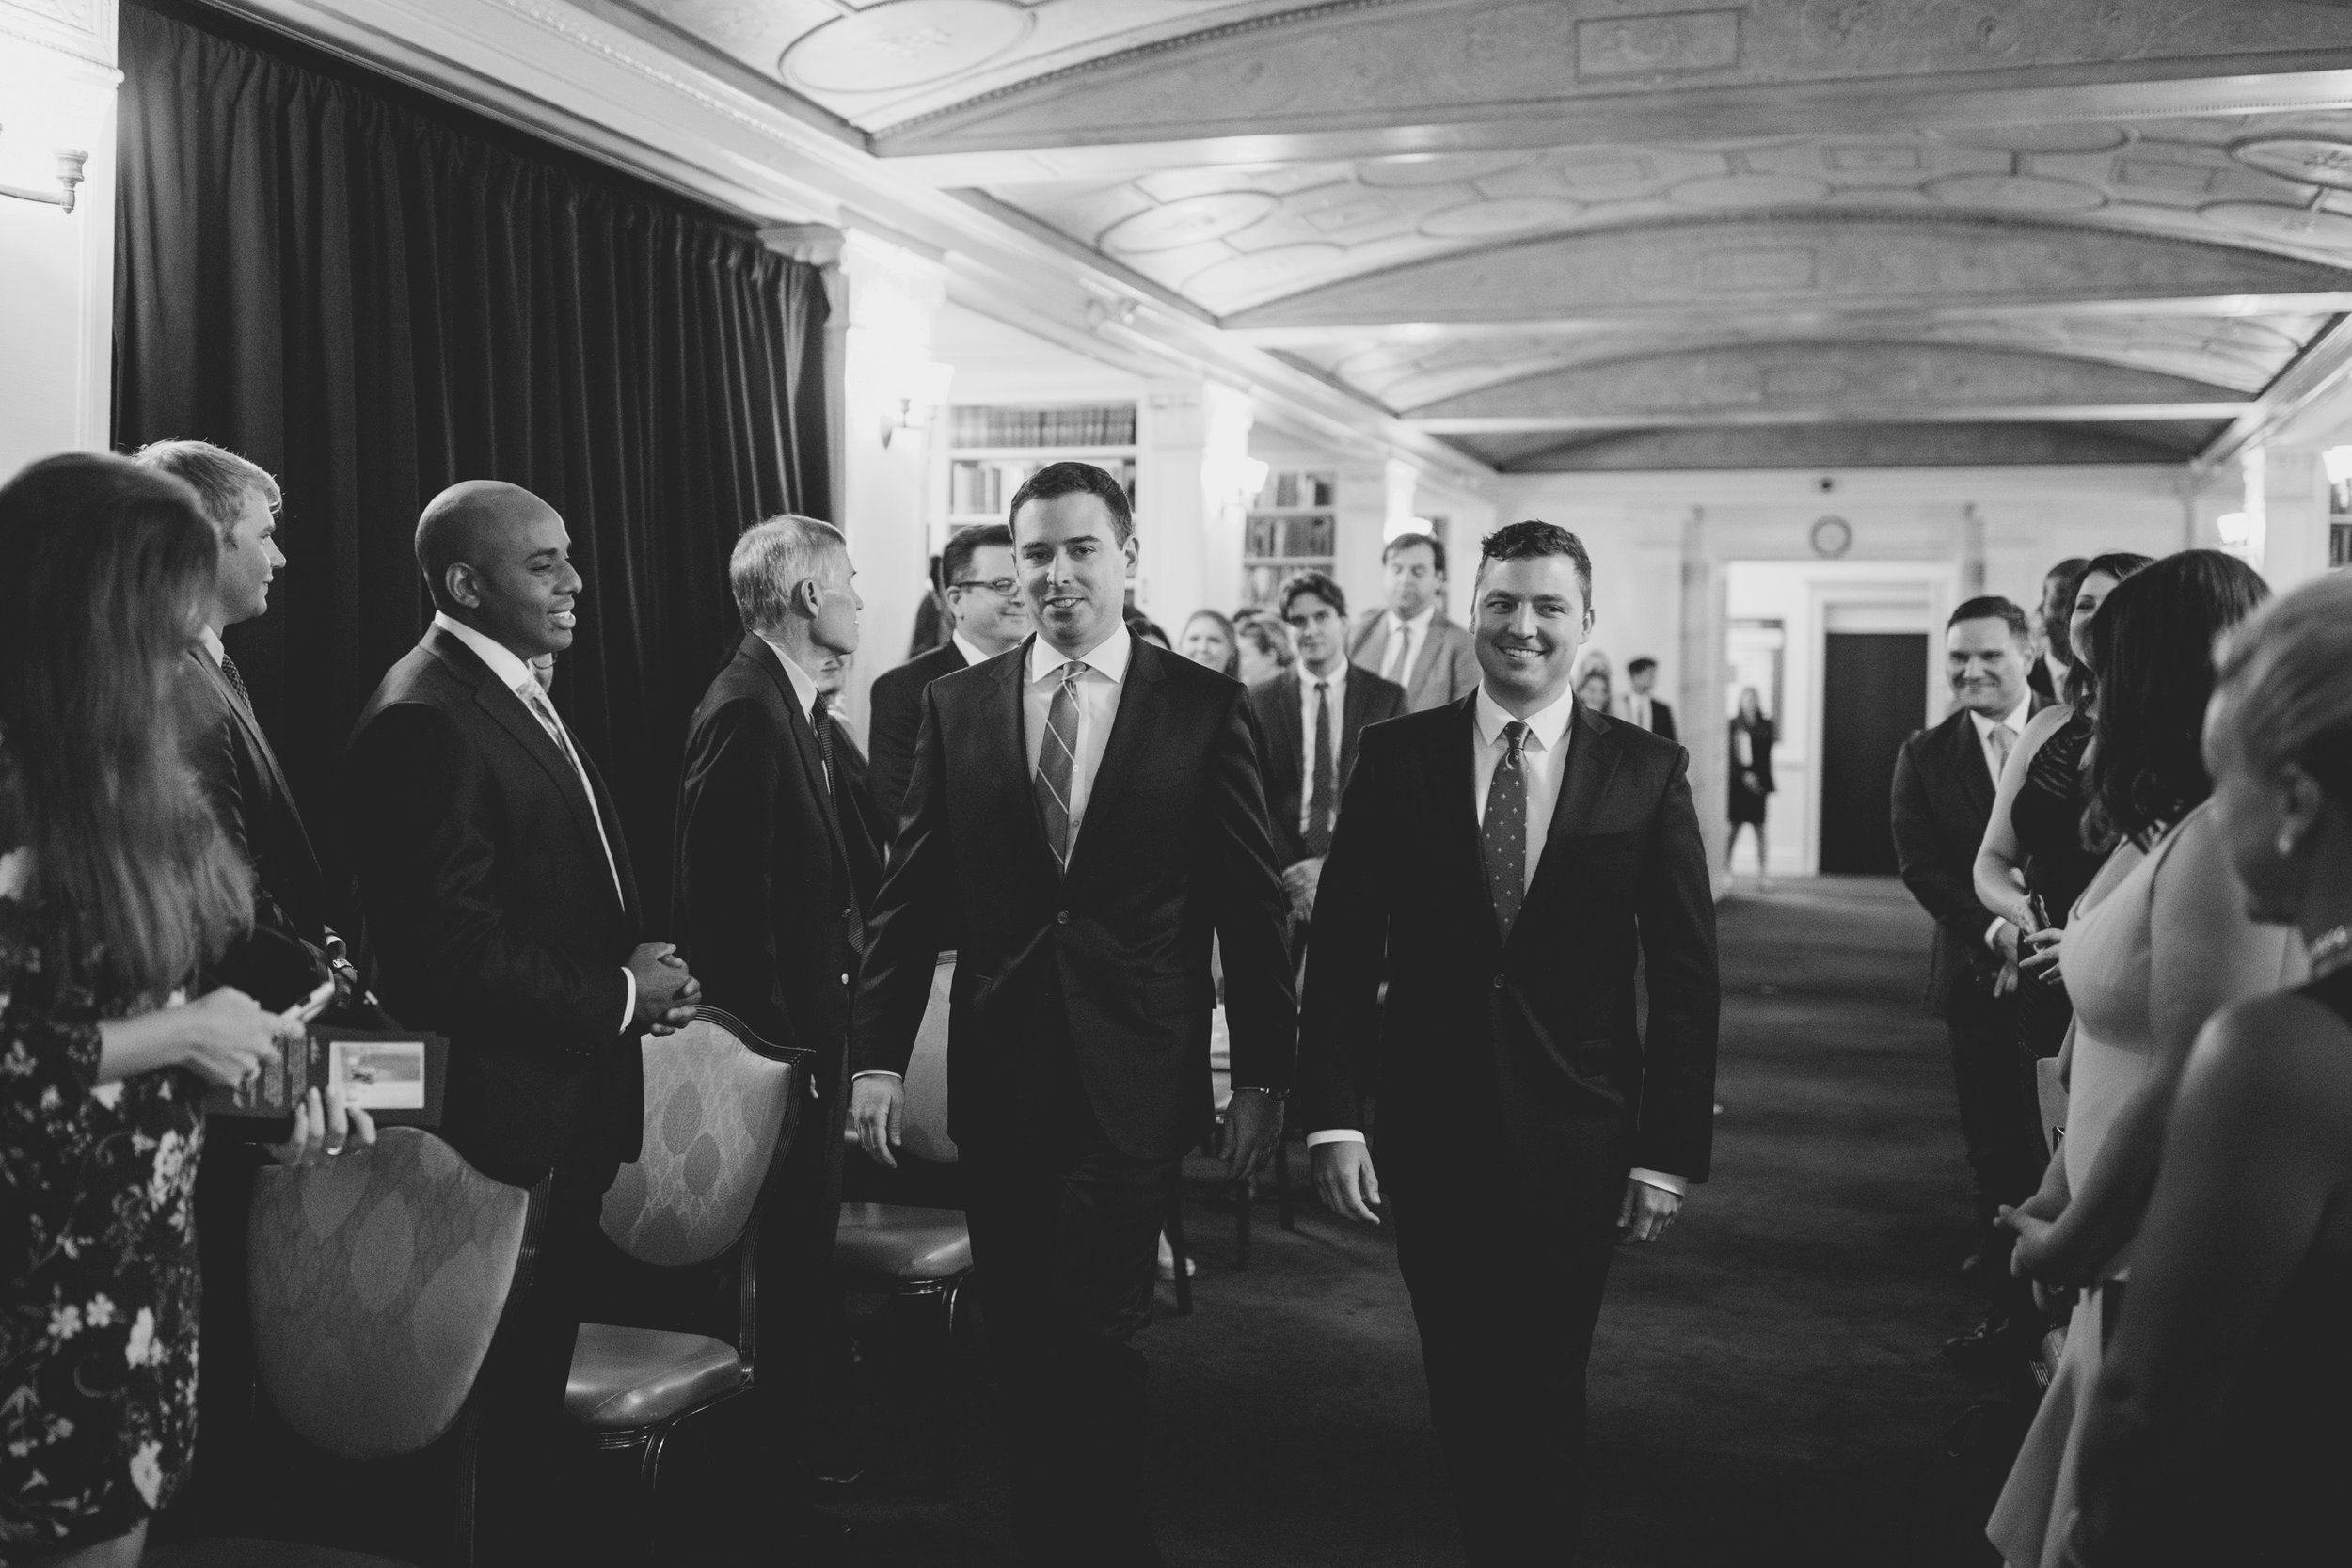 amanda_vanvels_new_york_lgbtq_gay_wedding_054.jpg